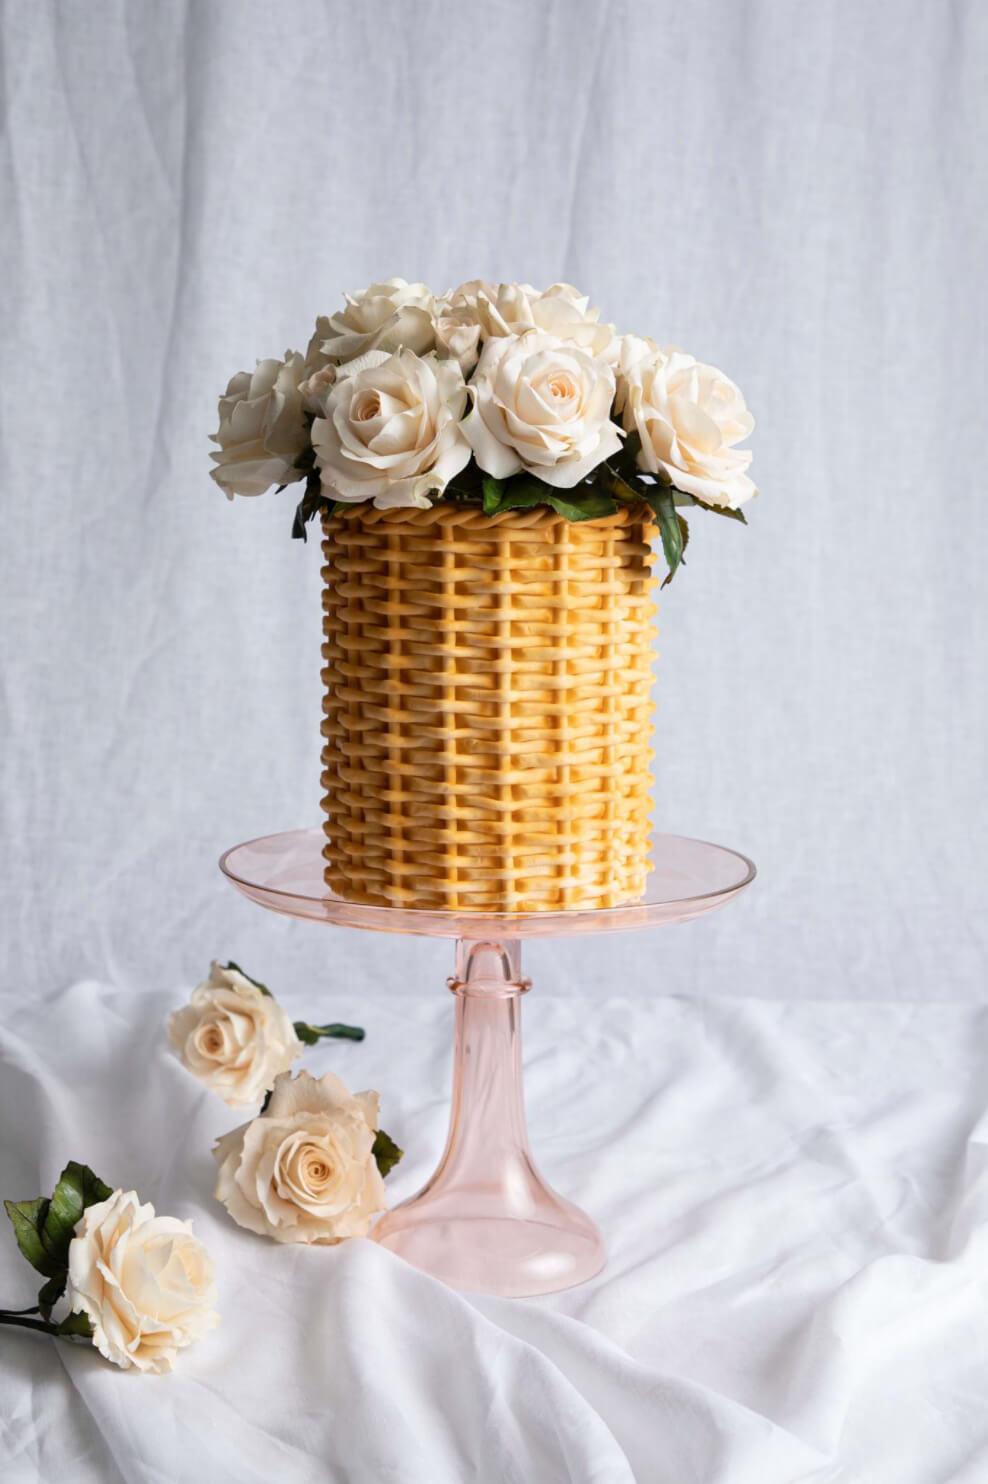 sugar flowers sugar roses rattan cake custom cakes by Julie McAllister Cakes